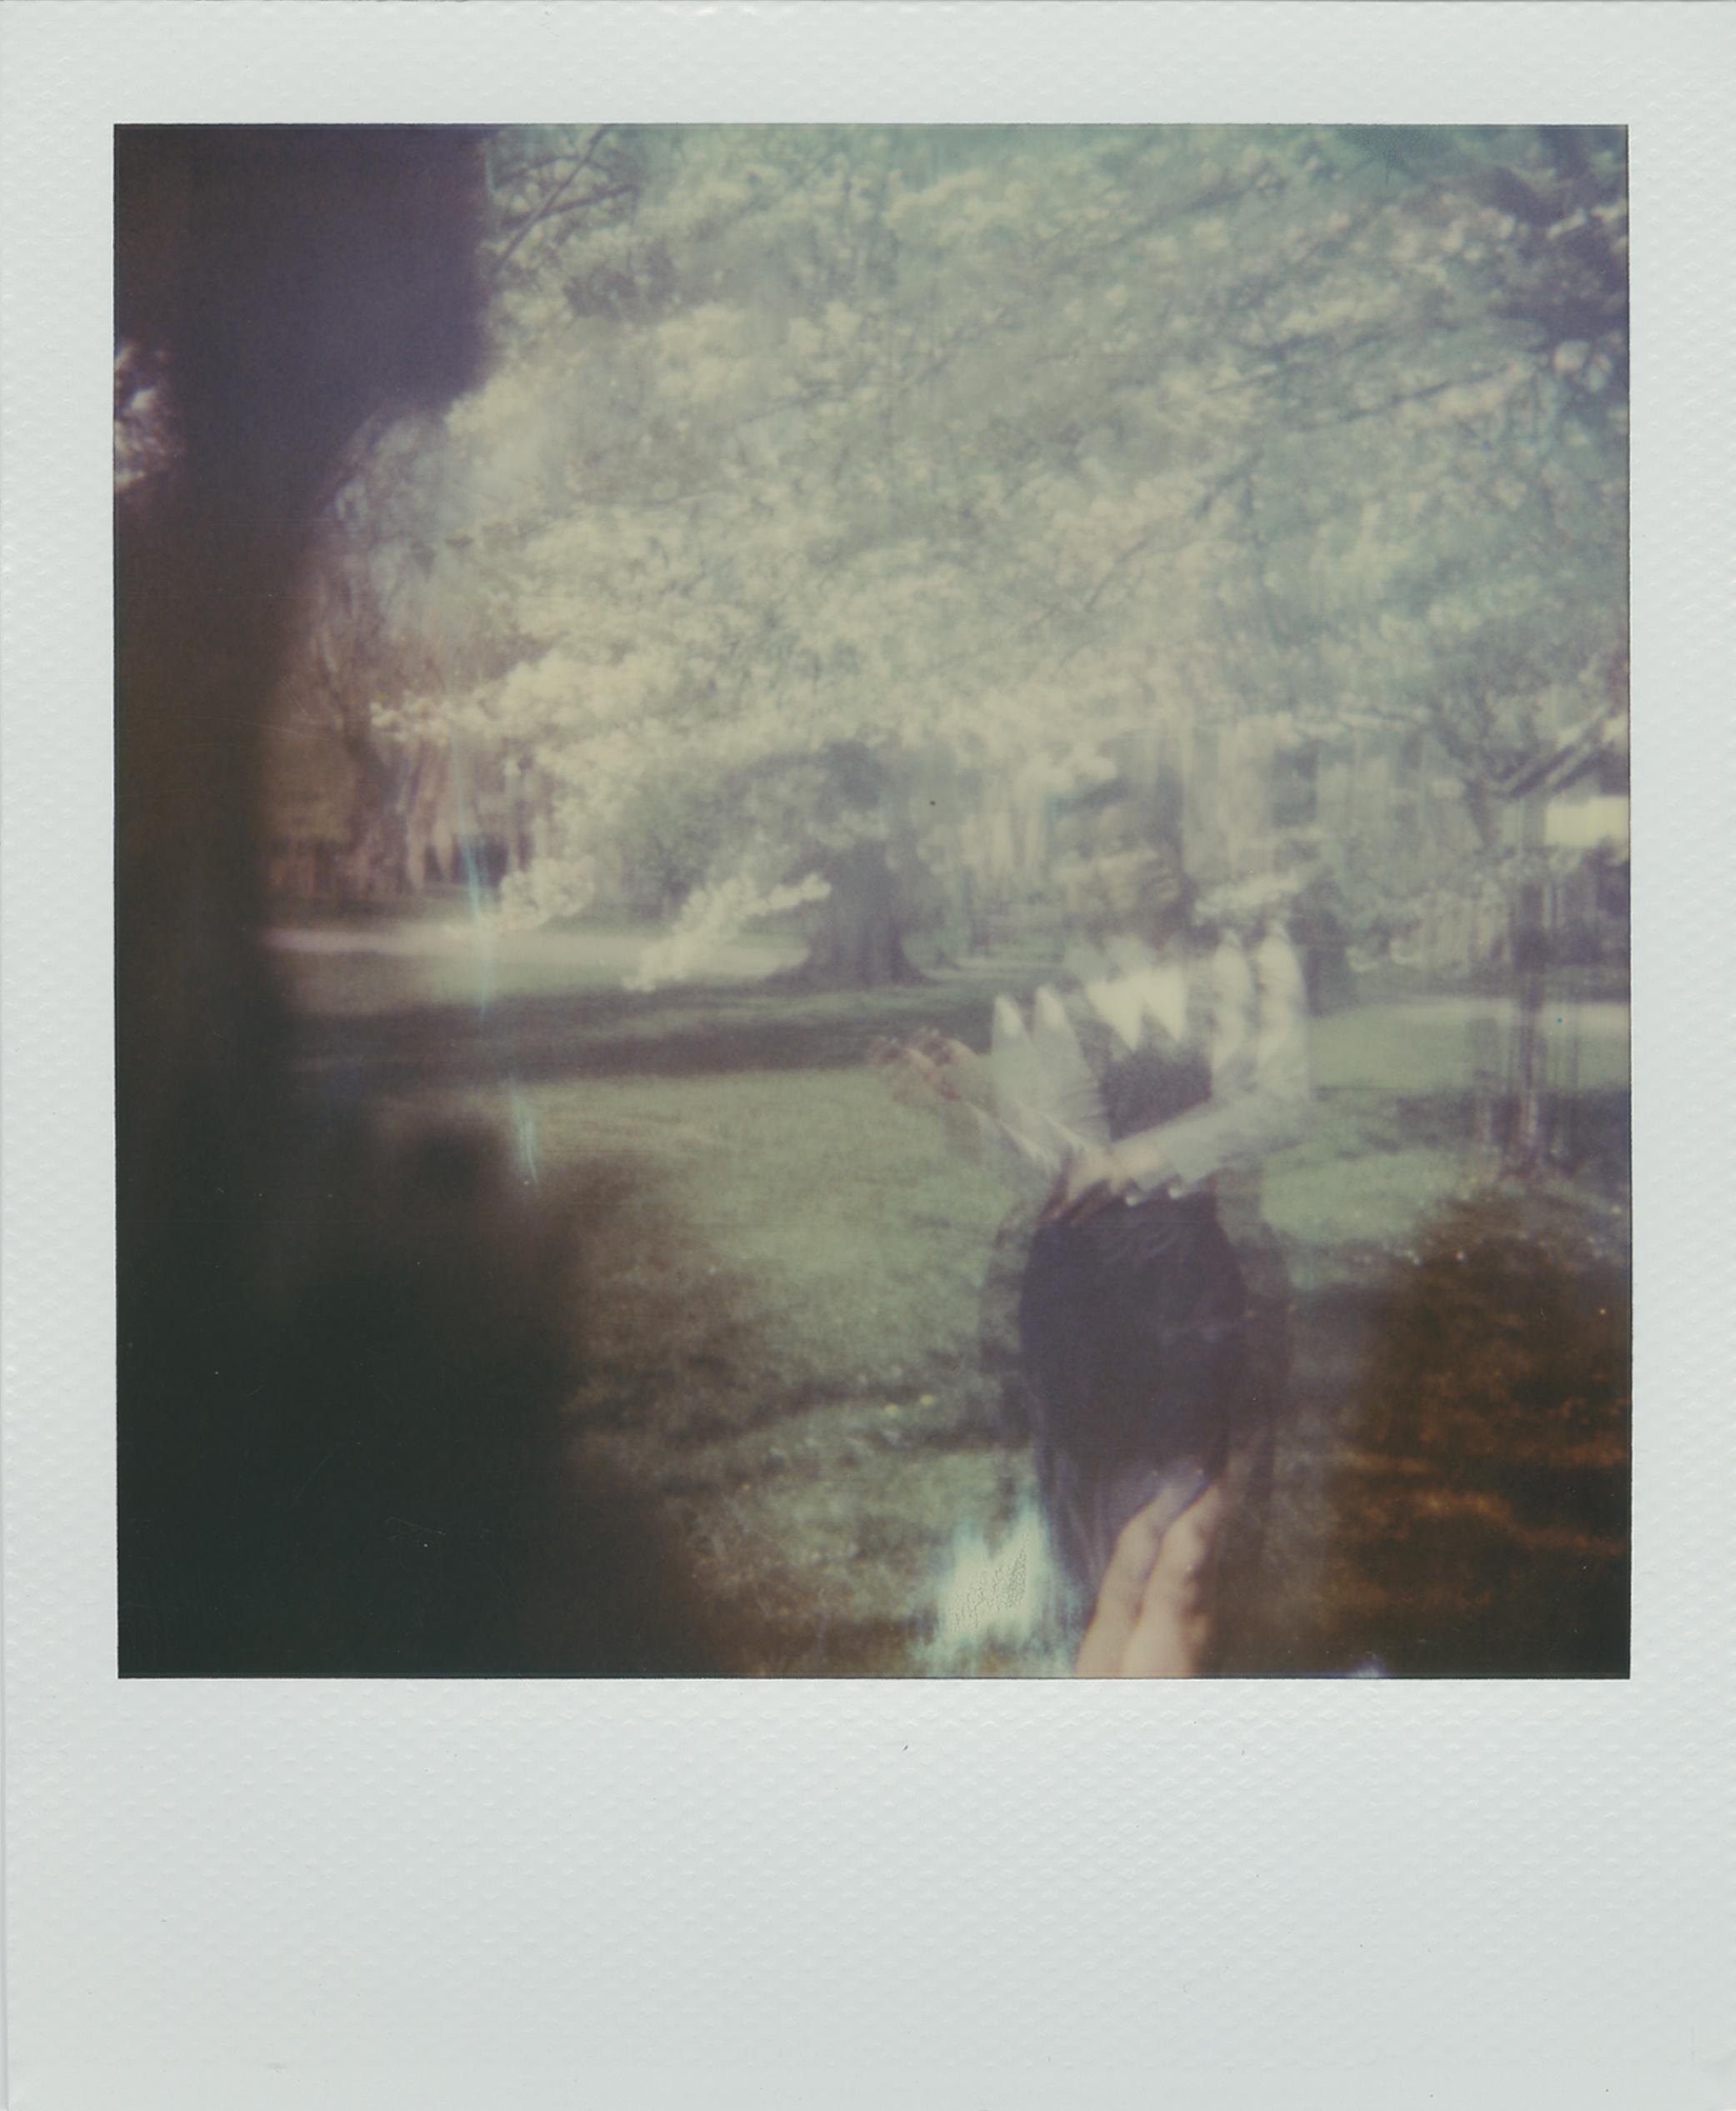 desta_polaroid_04.jpg